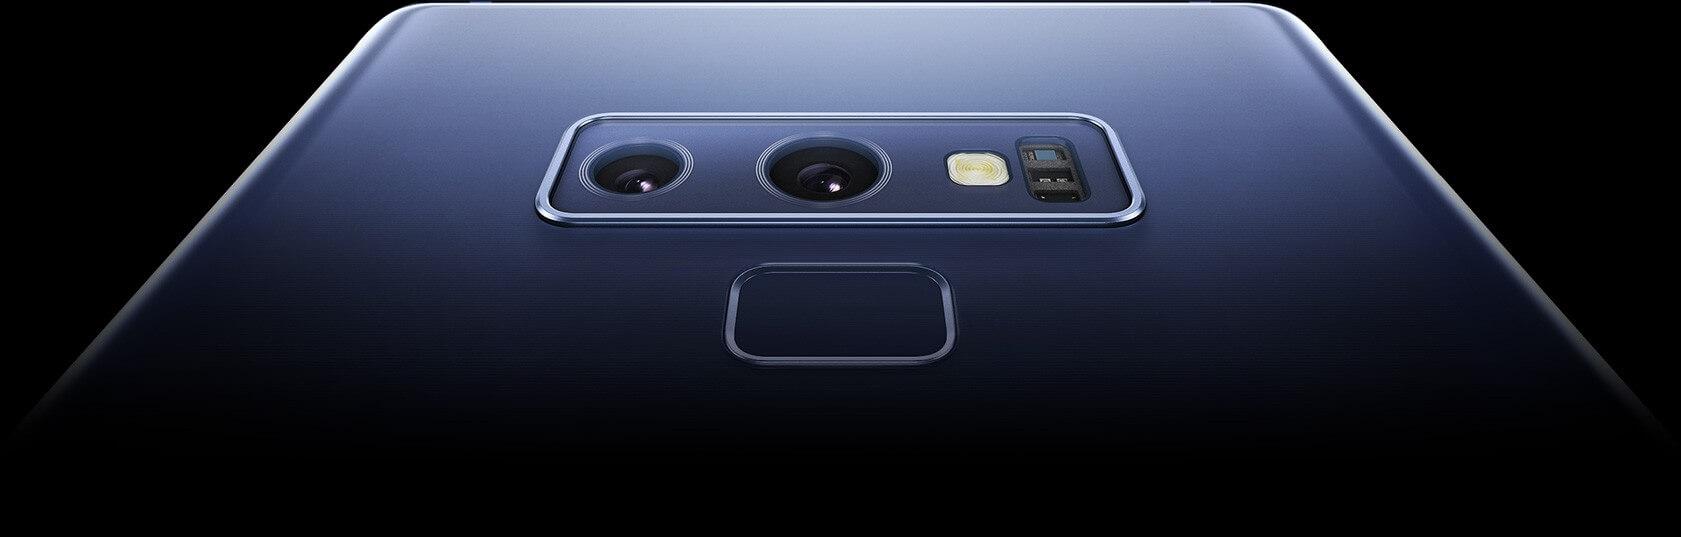 Galaxy Note9 背面